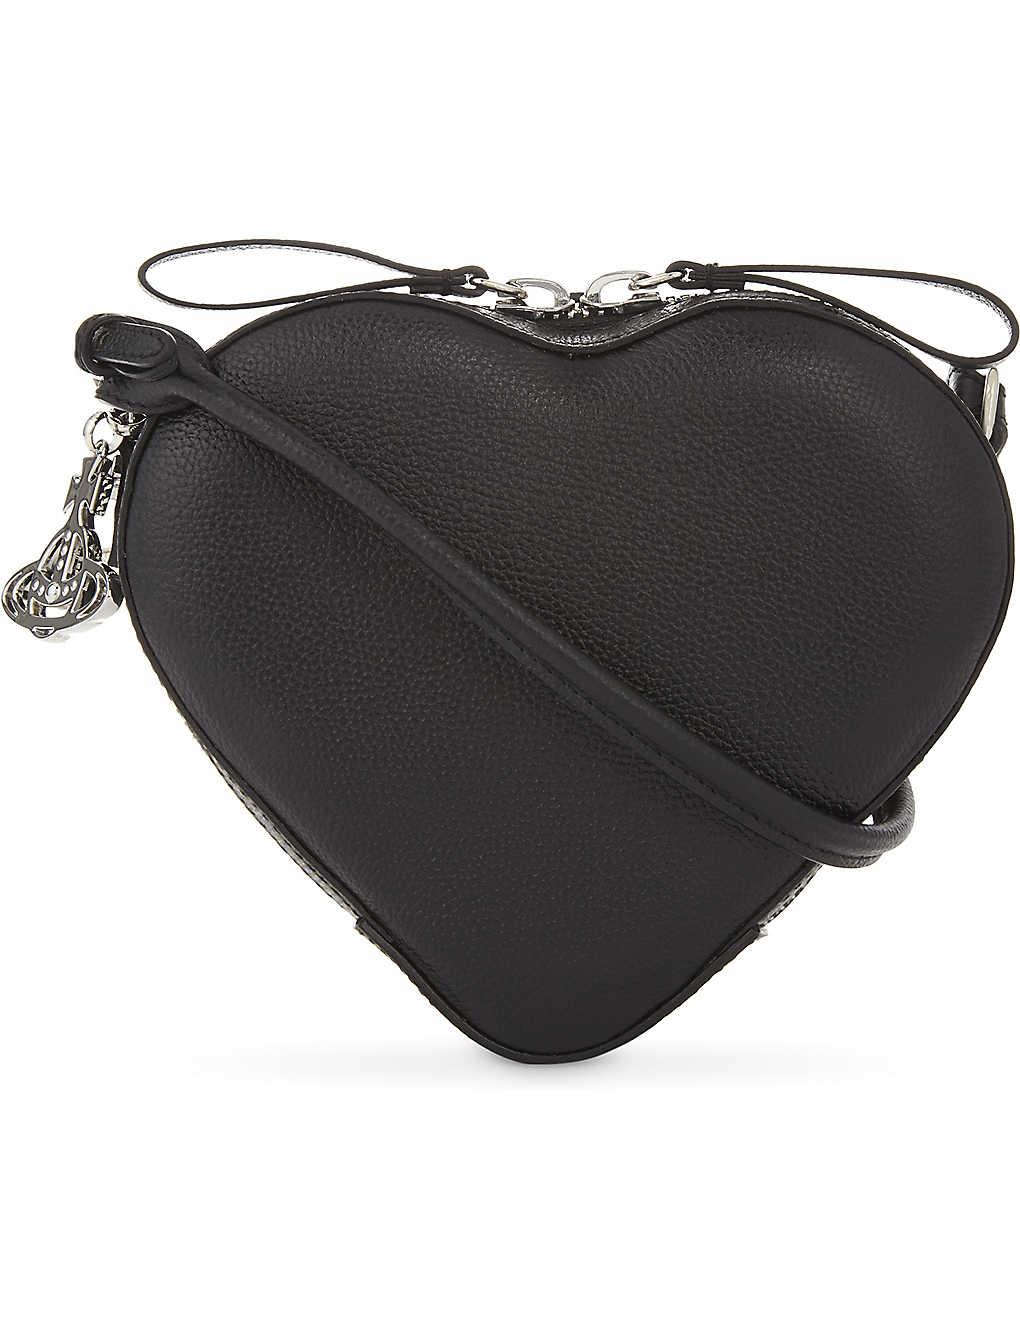 e2efafab14 VIVIENNE WESTWOOD Anglomania Johanna small heart leather cross-body bag